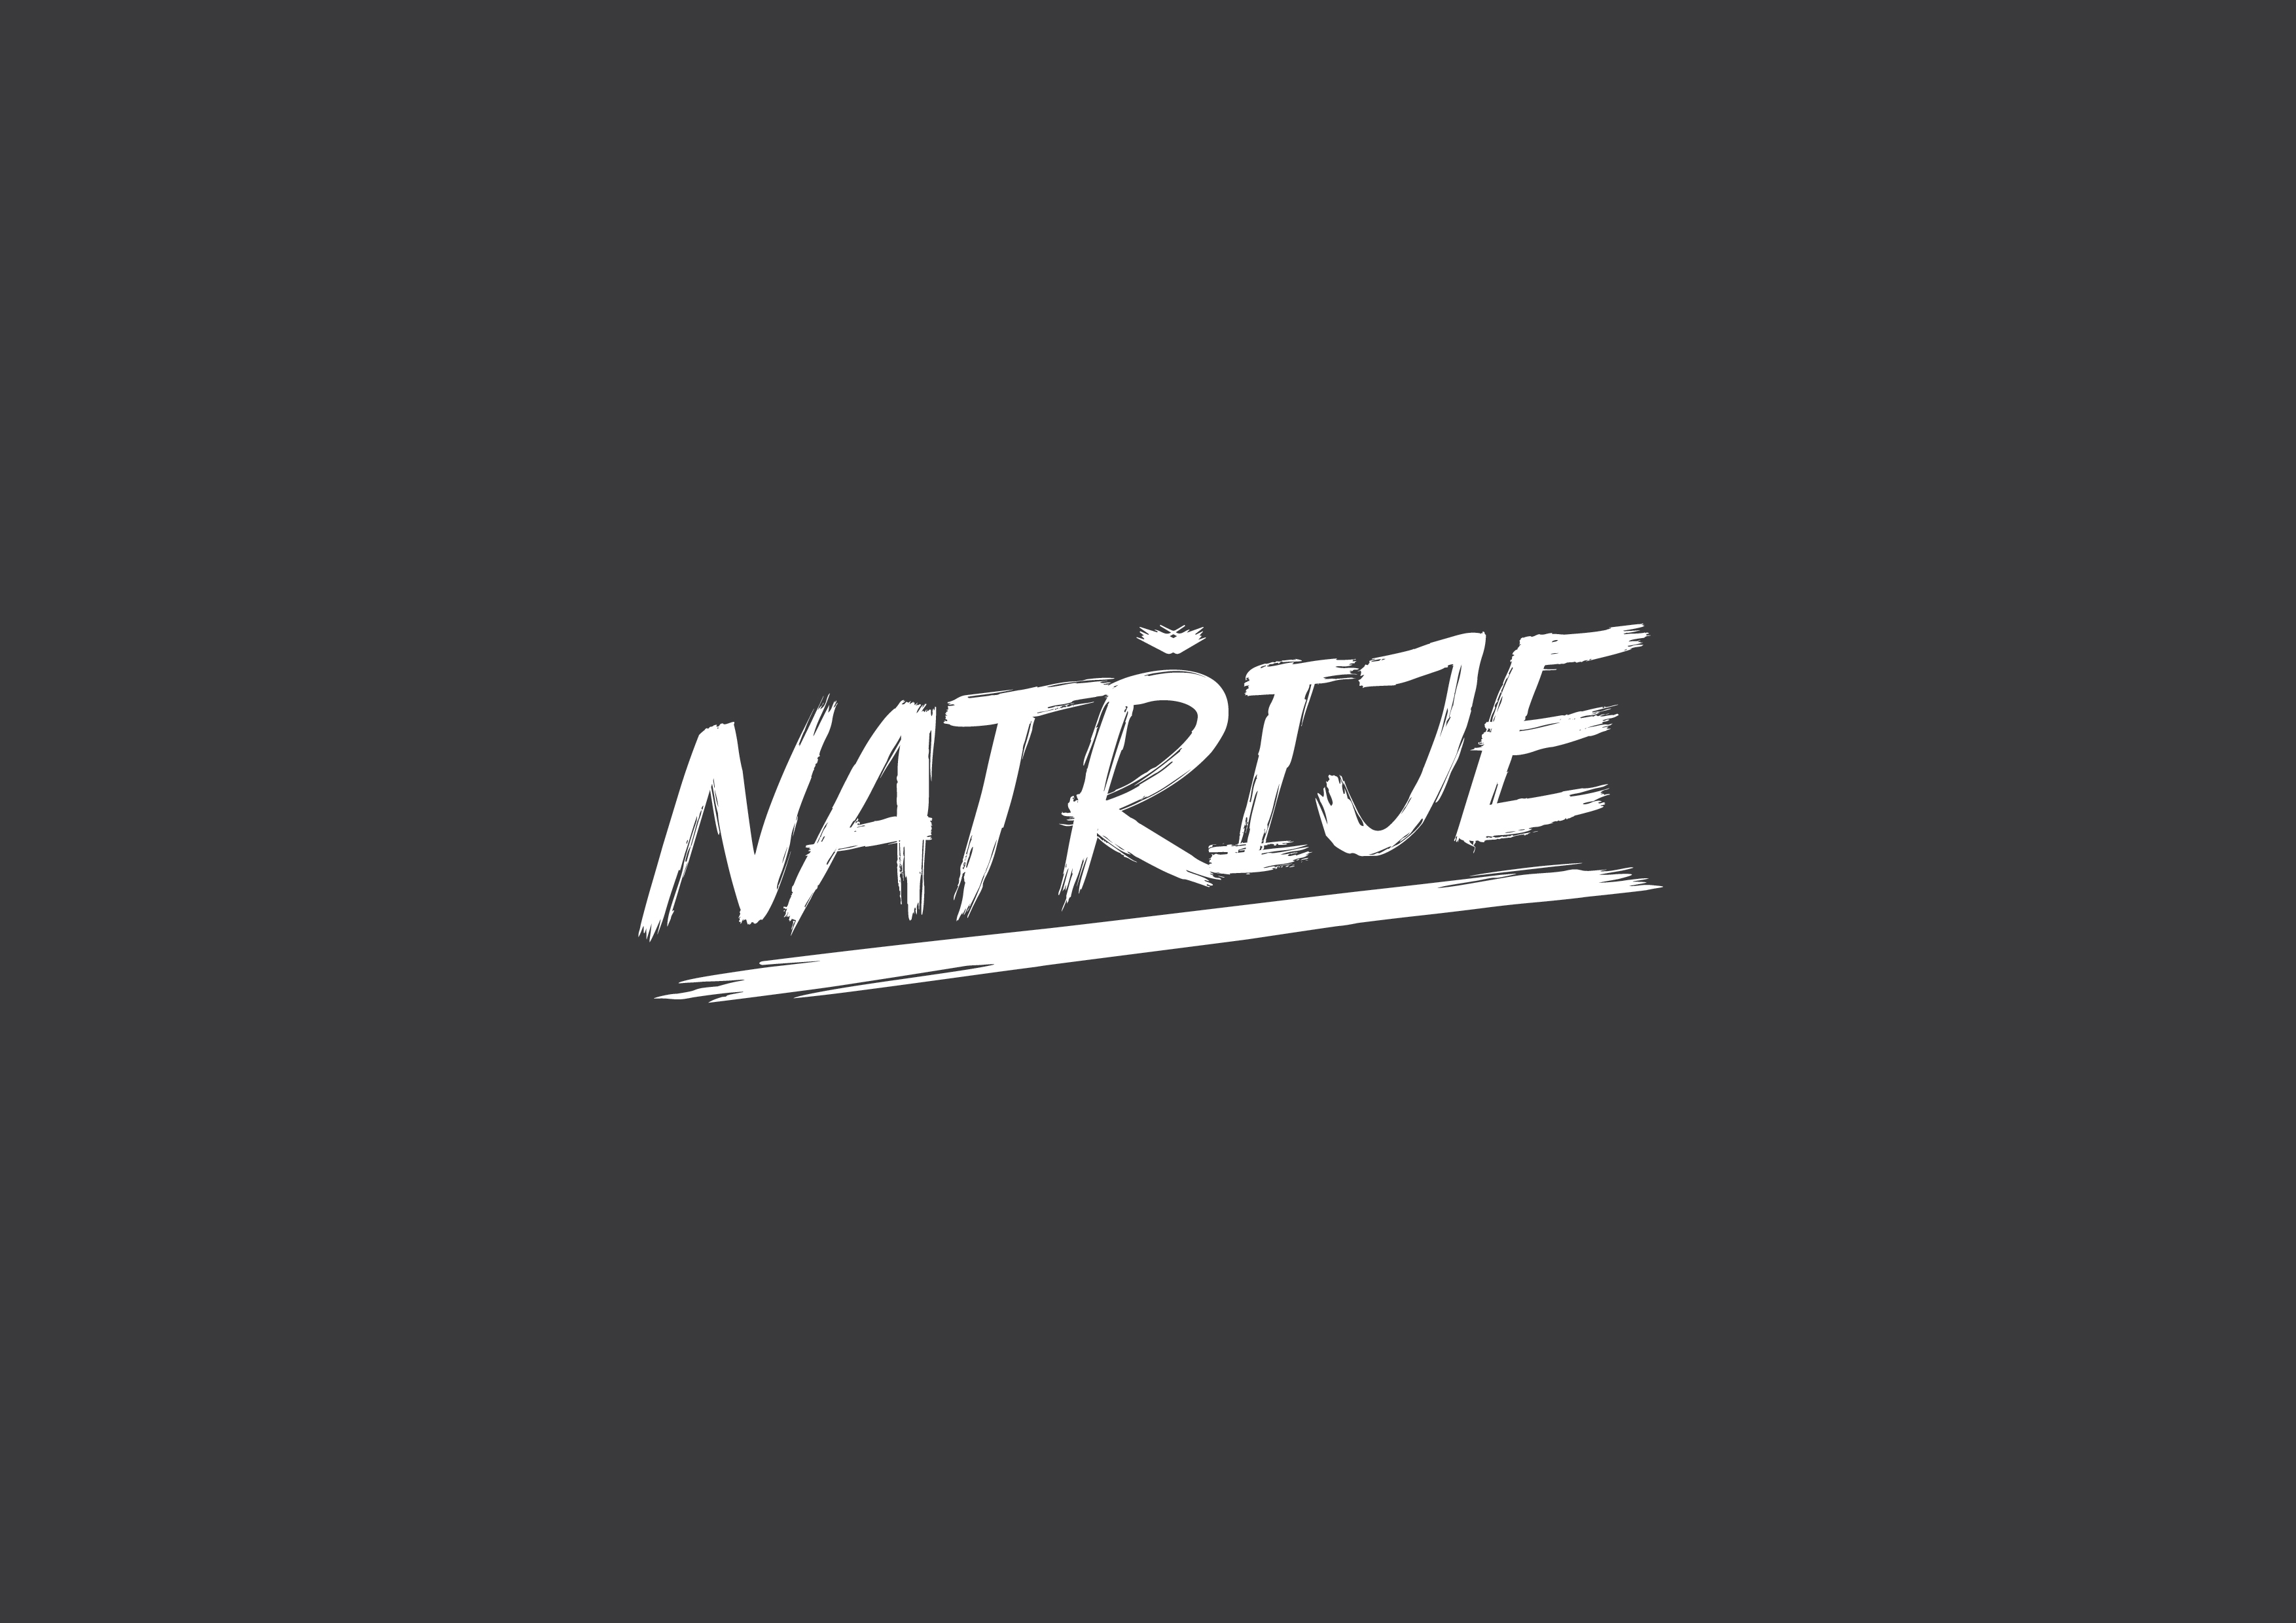 Natřije - 3G a LTE